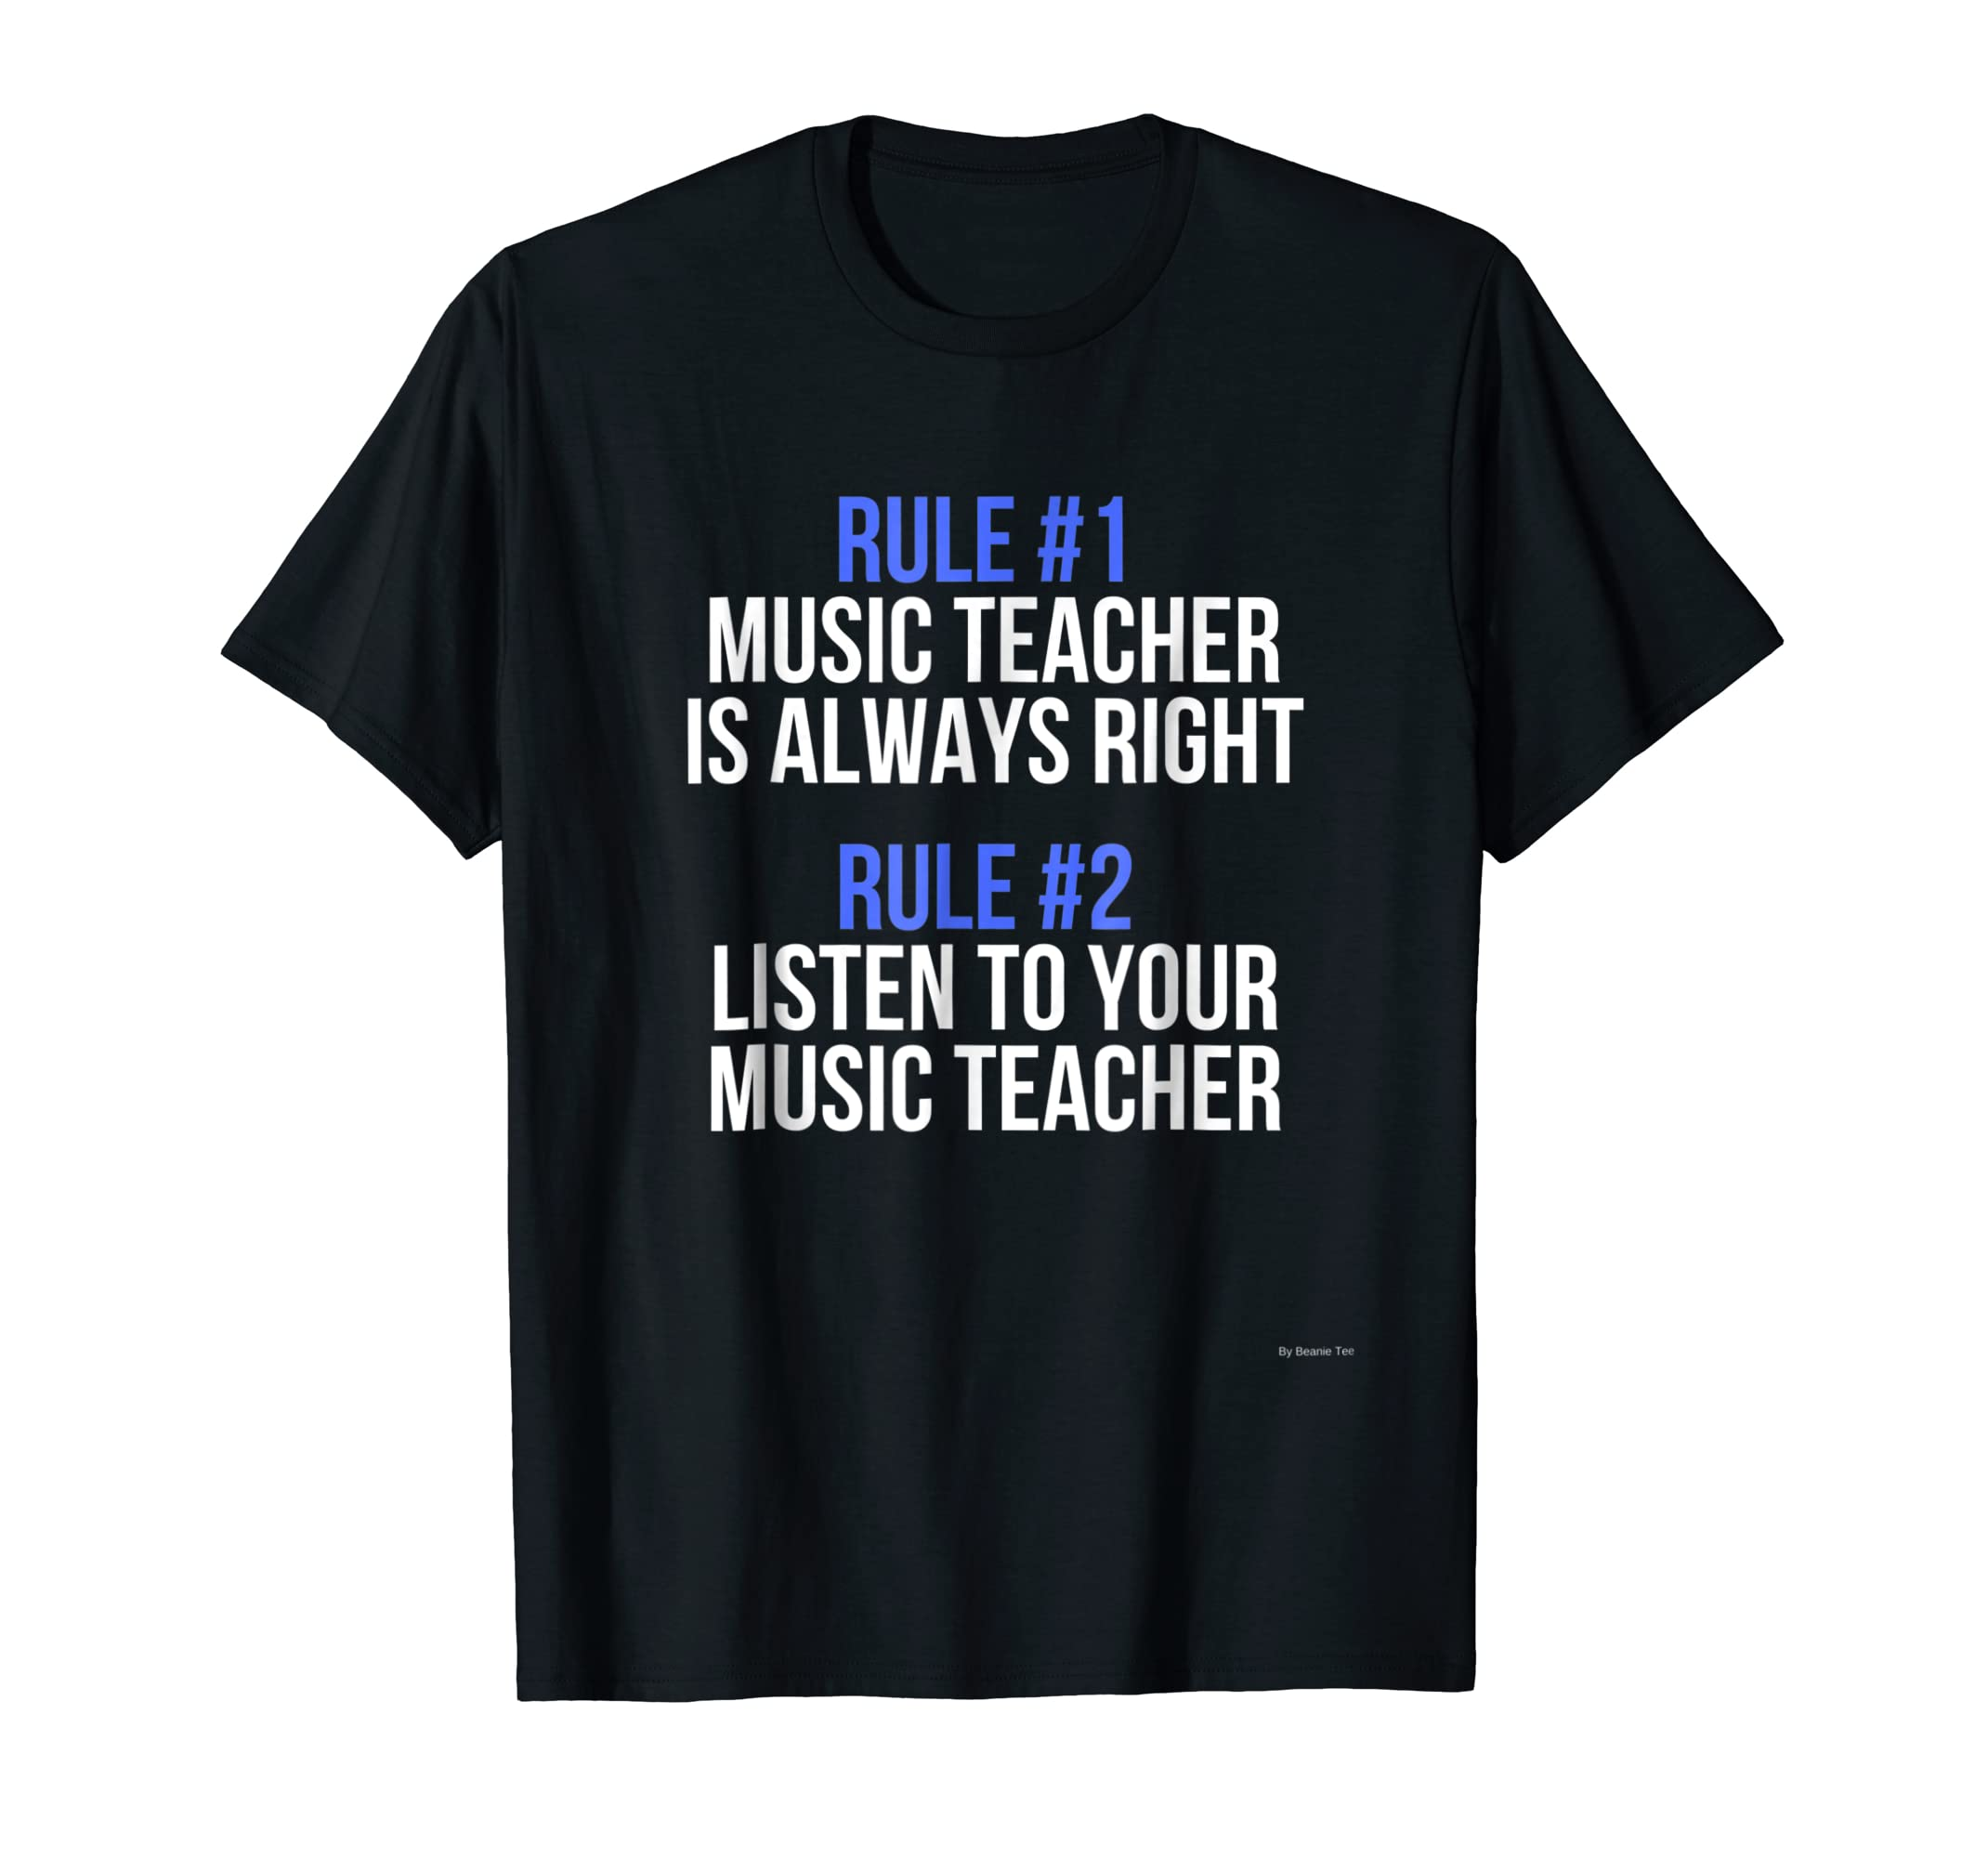 f015dc93 Amazon.com: Funny Music Teacher Shirt - Gift For Music Teachers: Clothing